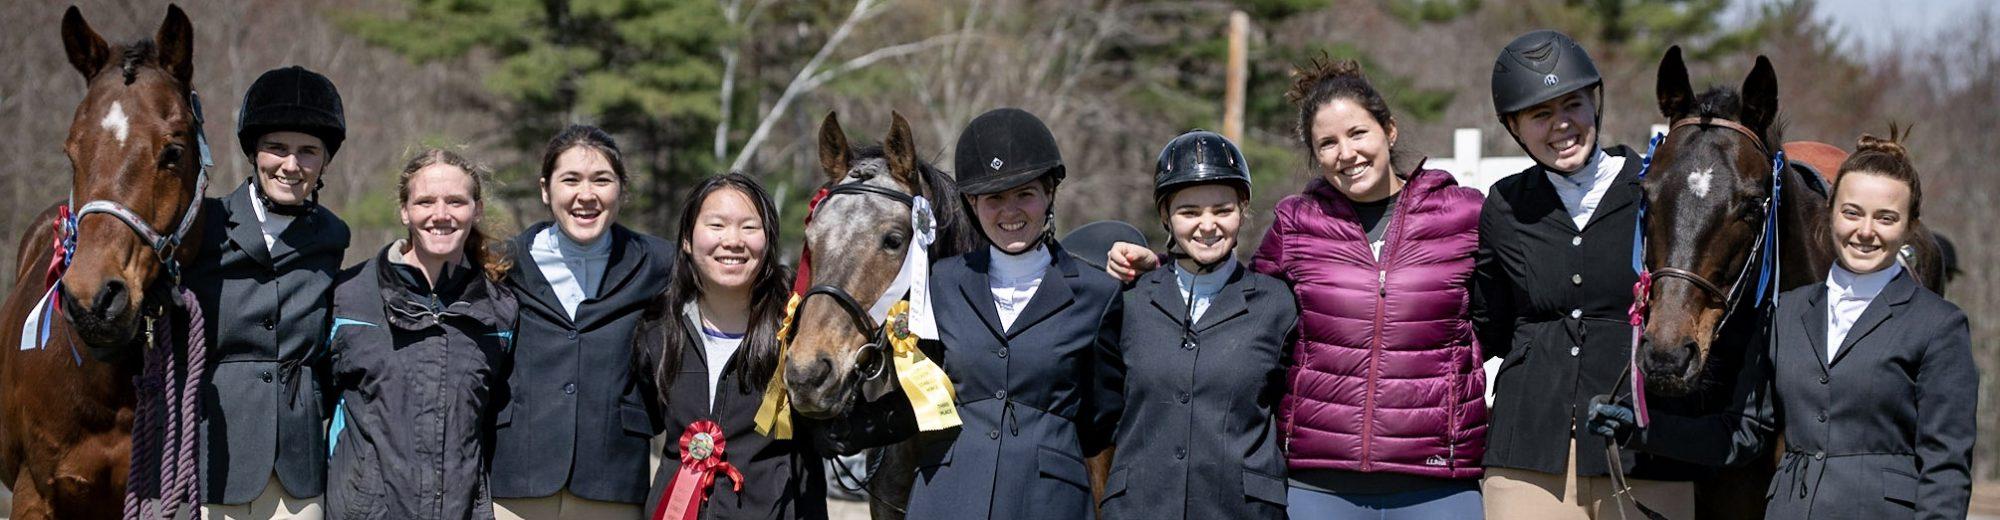 Bowdoin College Equestrian Team